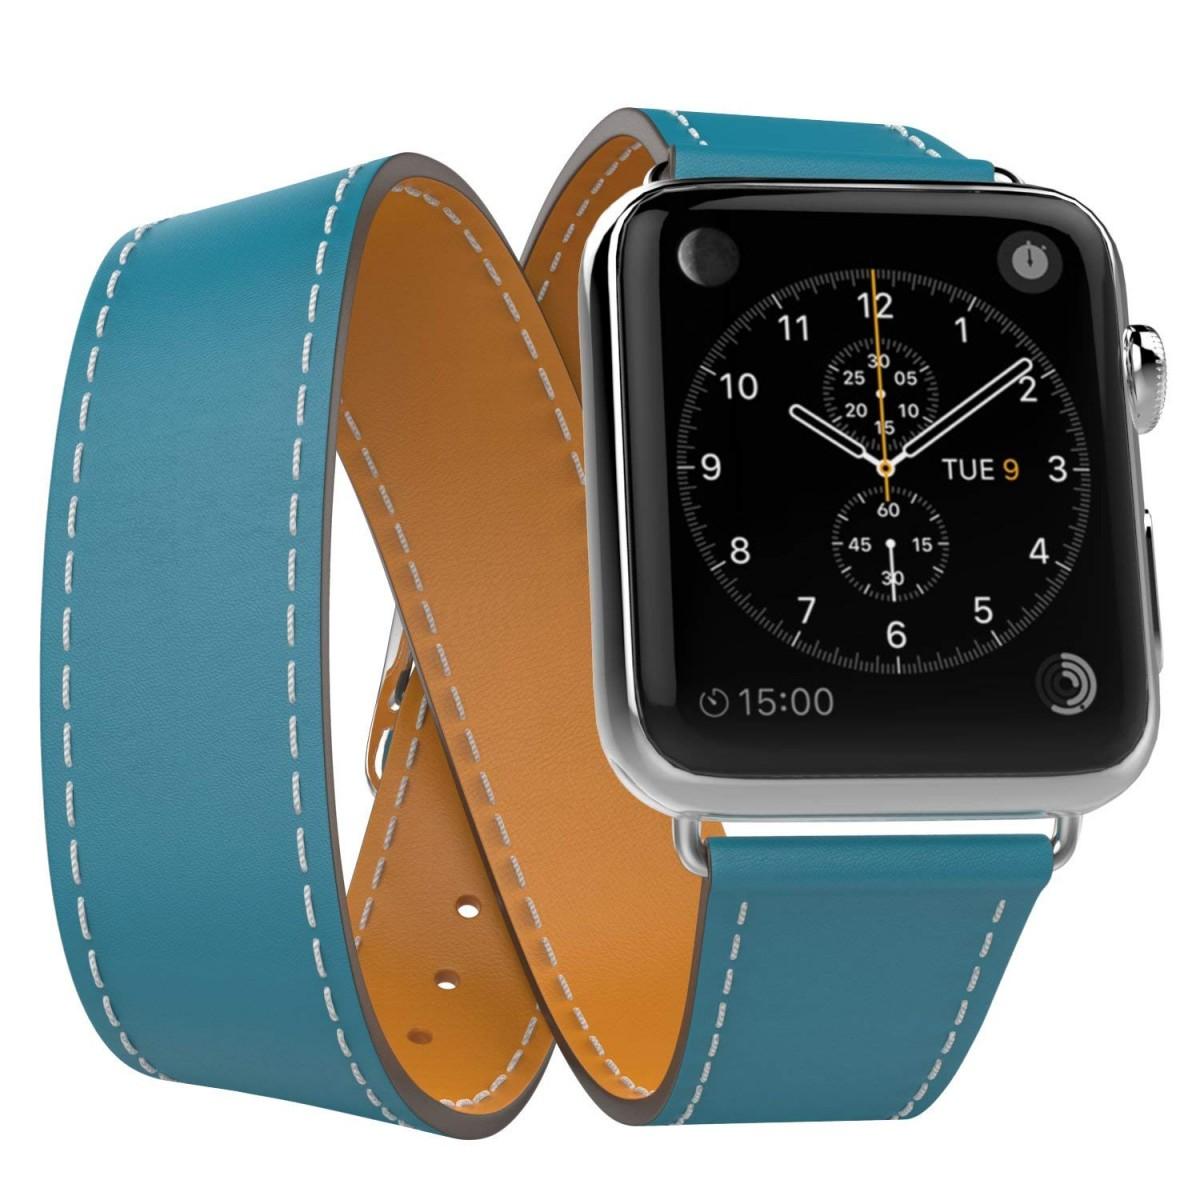 Řemínek Double Tour pro Apple Watch Series 3/2/1 (42mm) - Modrý